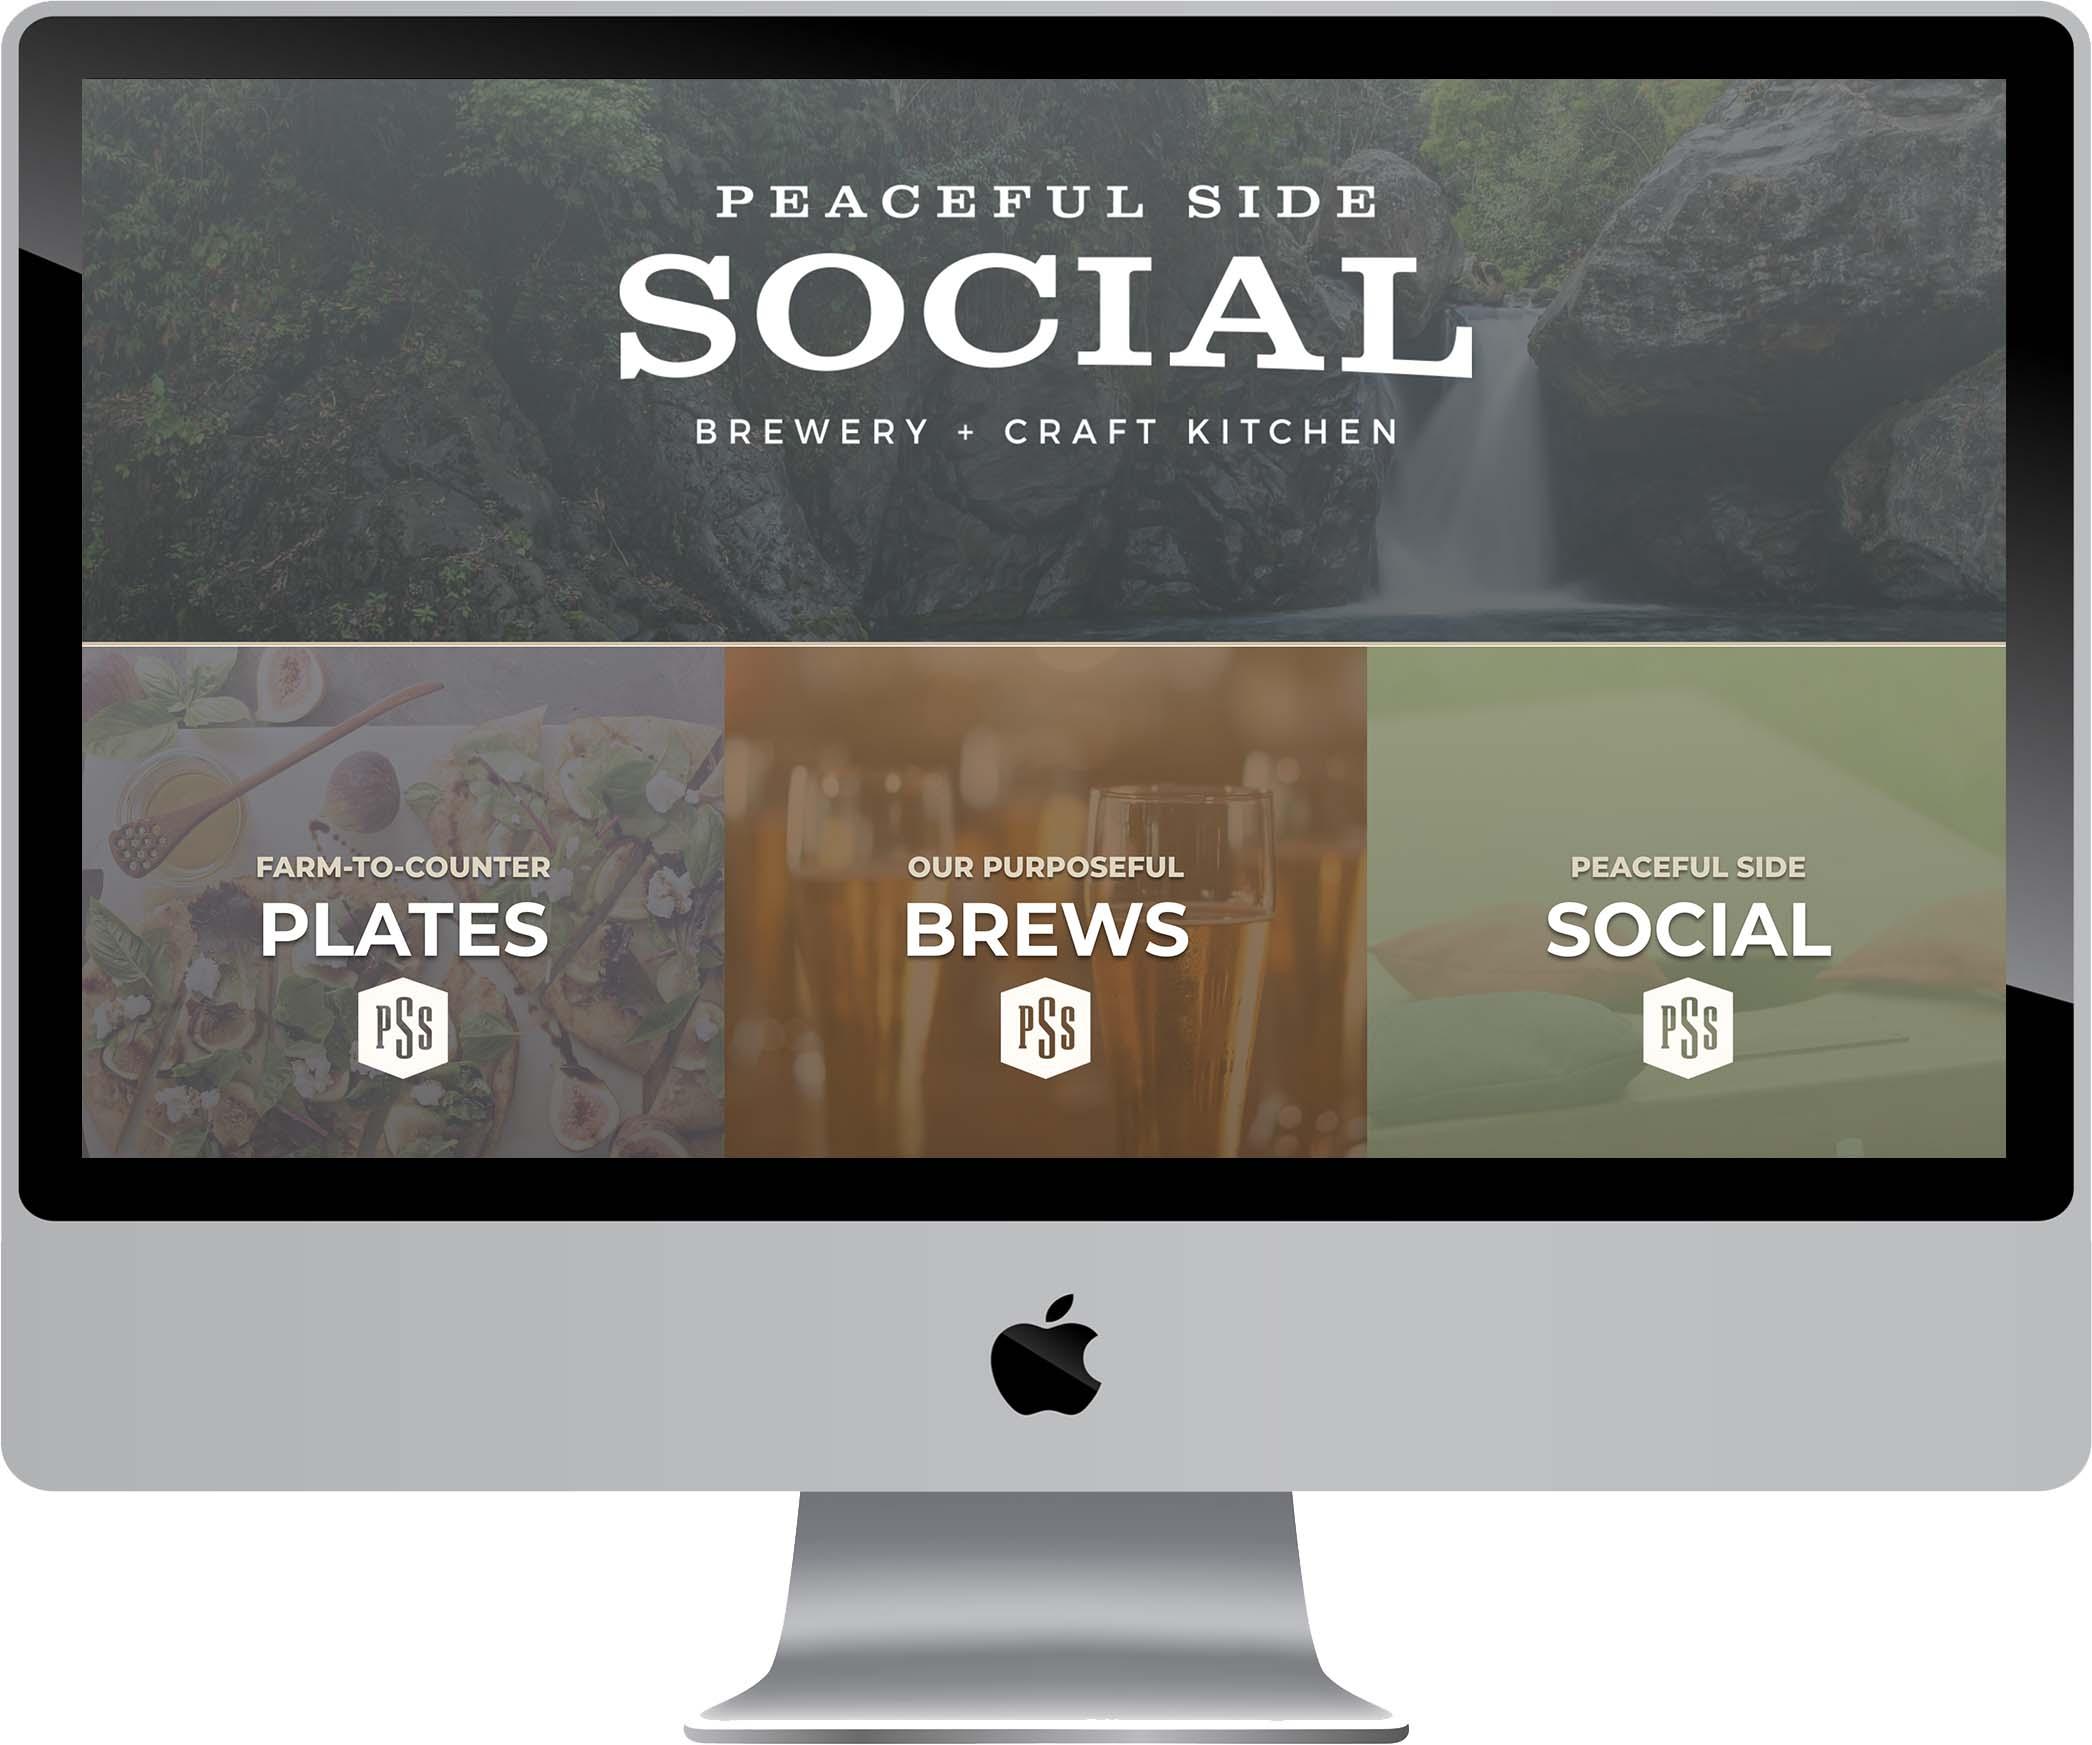 Peaceful Side Social Website Design